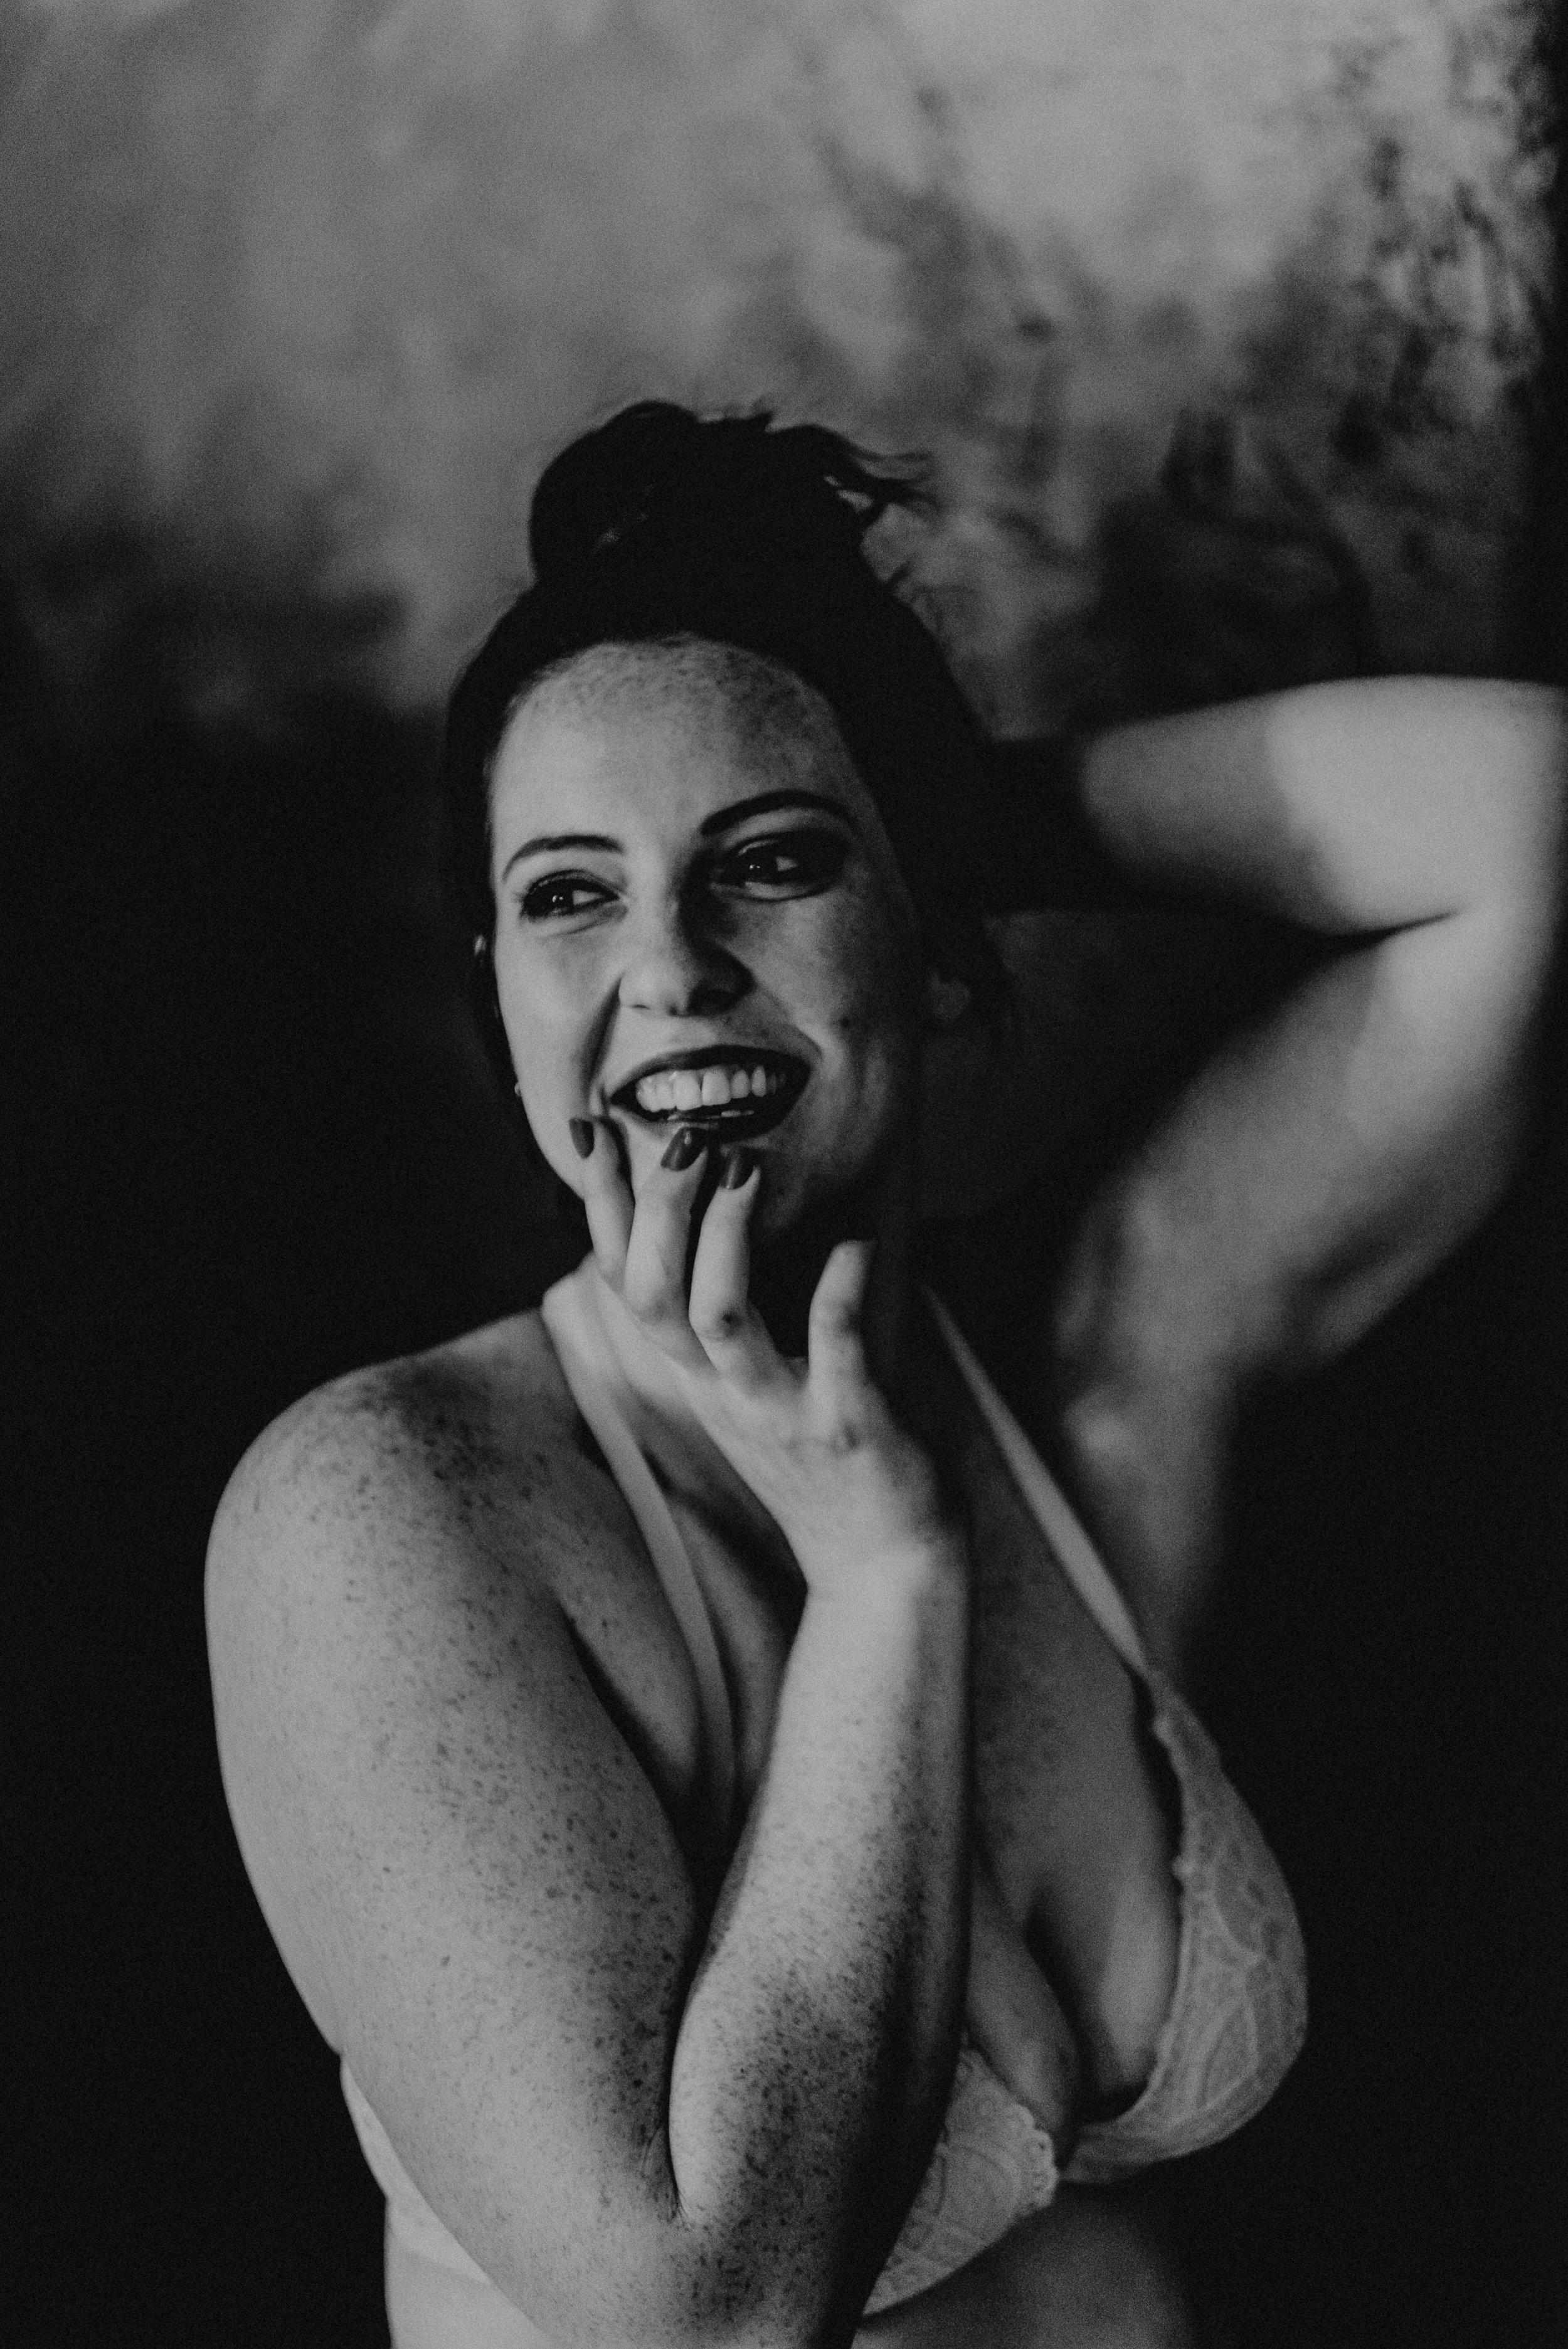 cat wilkinson nashville boudoir session by wilde company-36.jpg